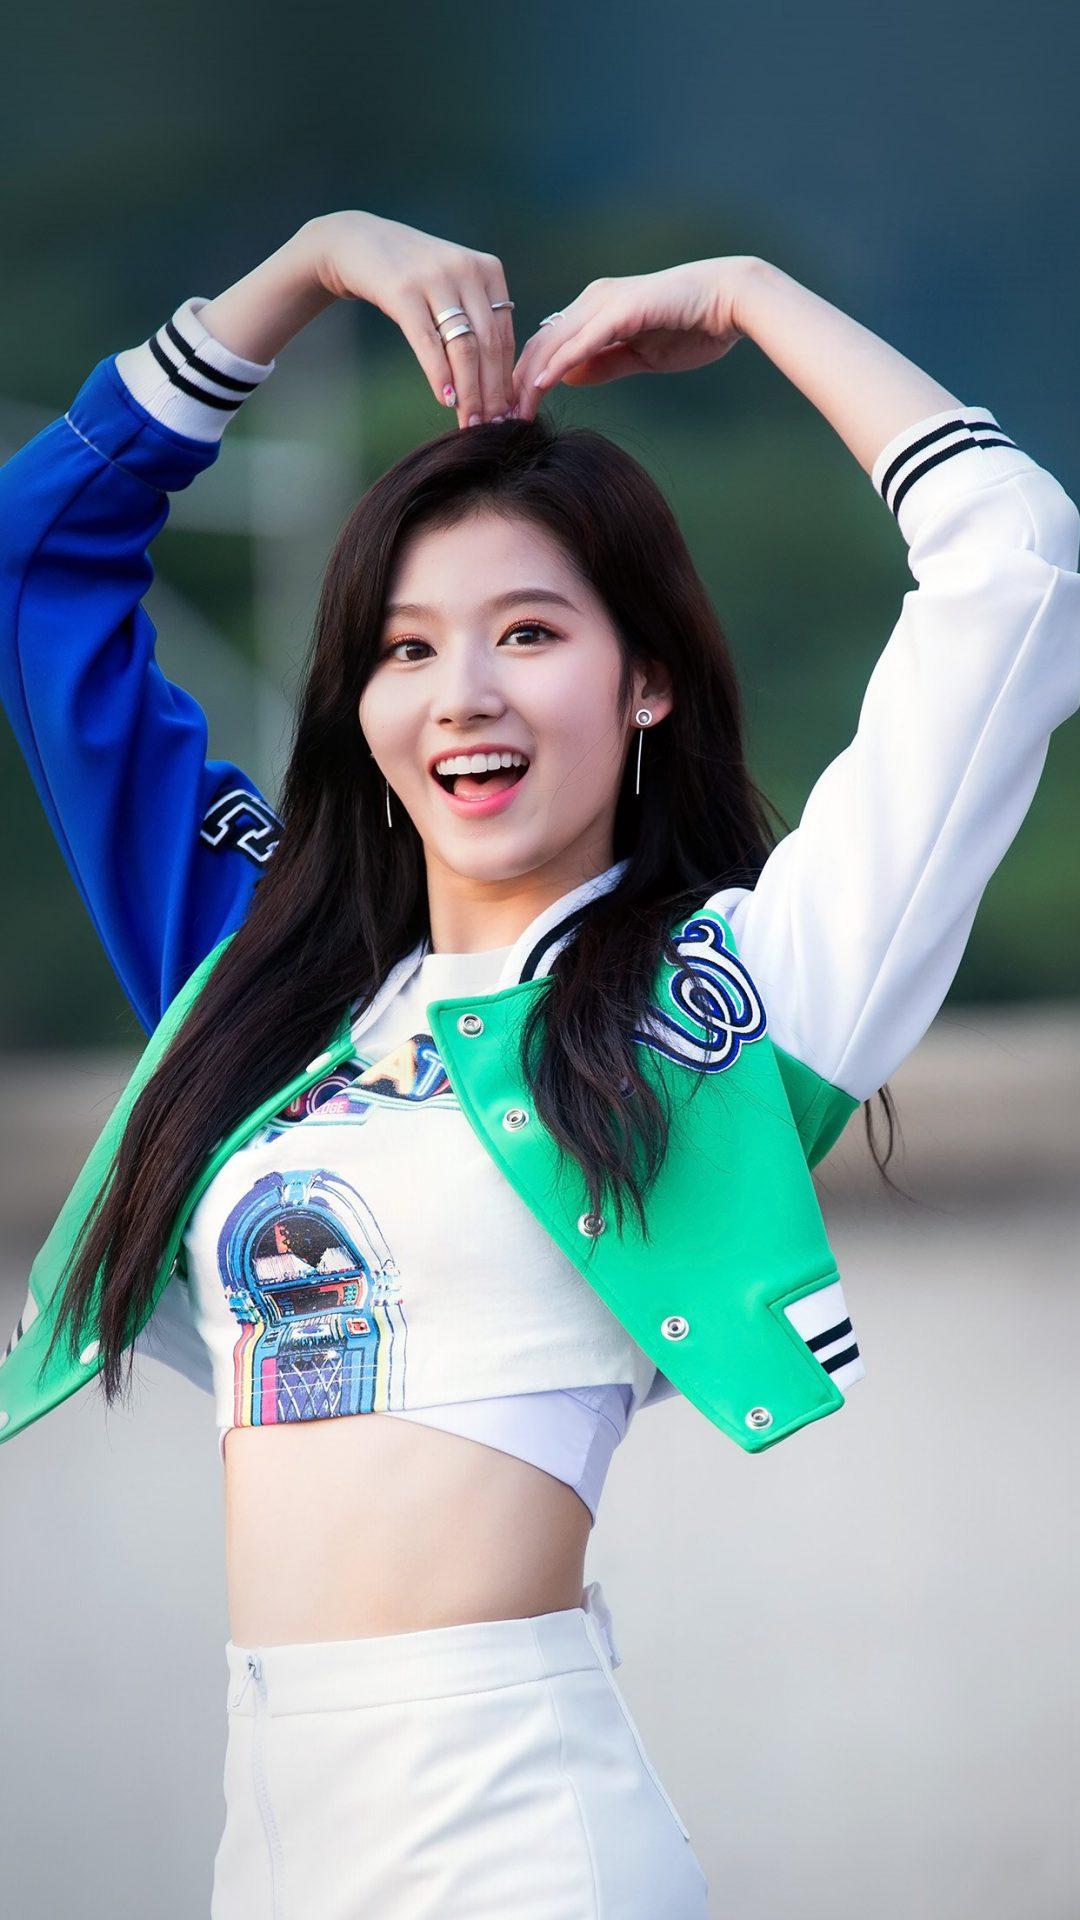 Kpop Sana Heart Love Cute Girl Celebrity